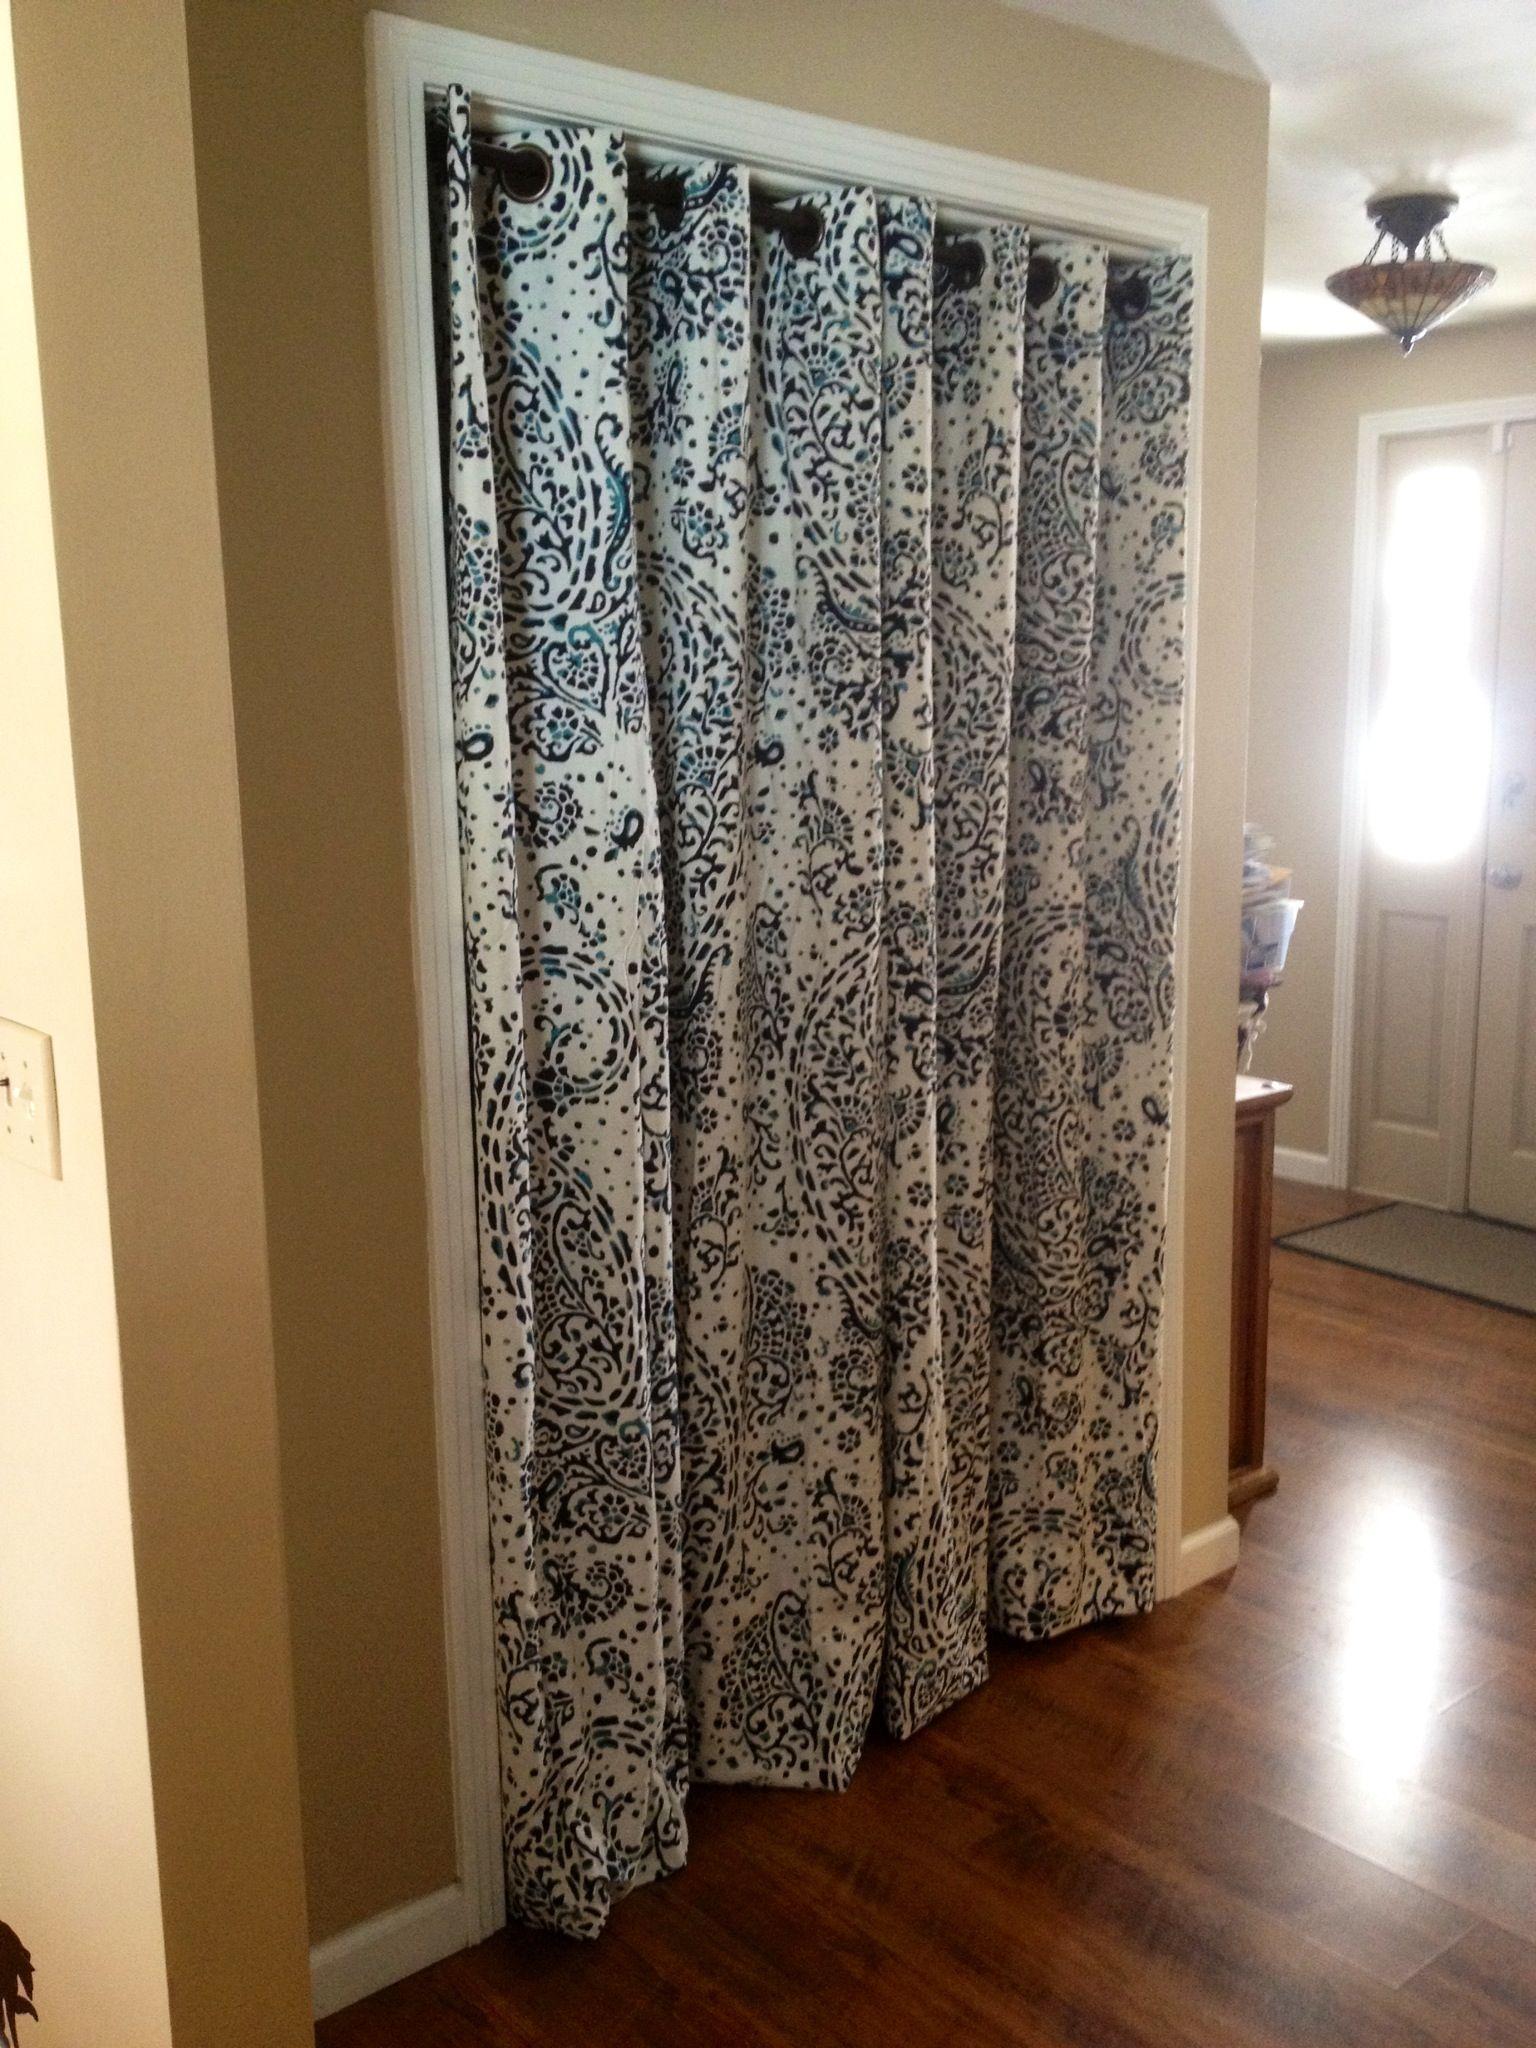 no more pinch y sliding closet doors hello pretty curtains diy favorites fsm pinterest. Black Bedroom Furniture Sets. Home Design Ideas